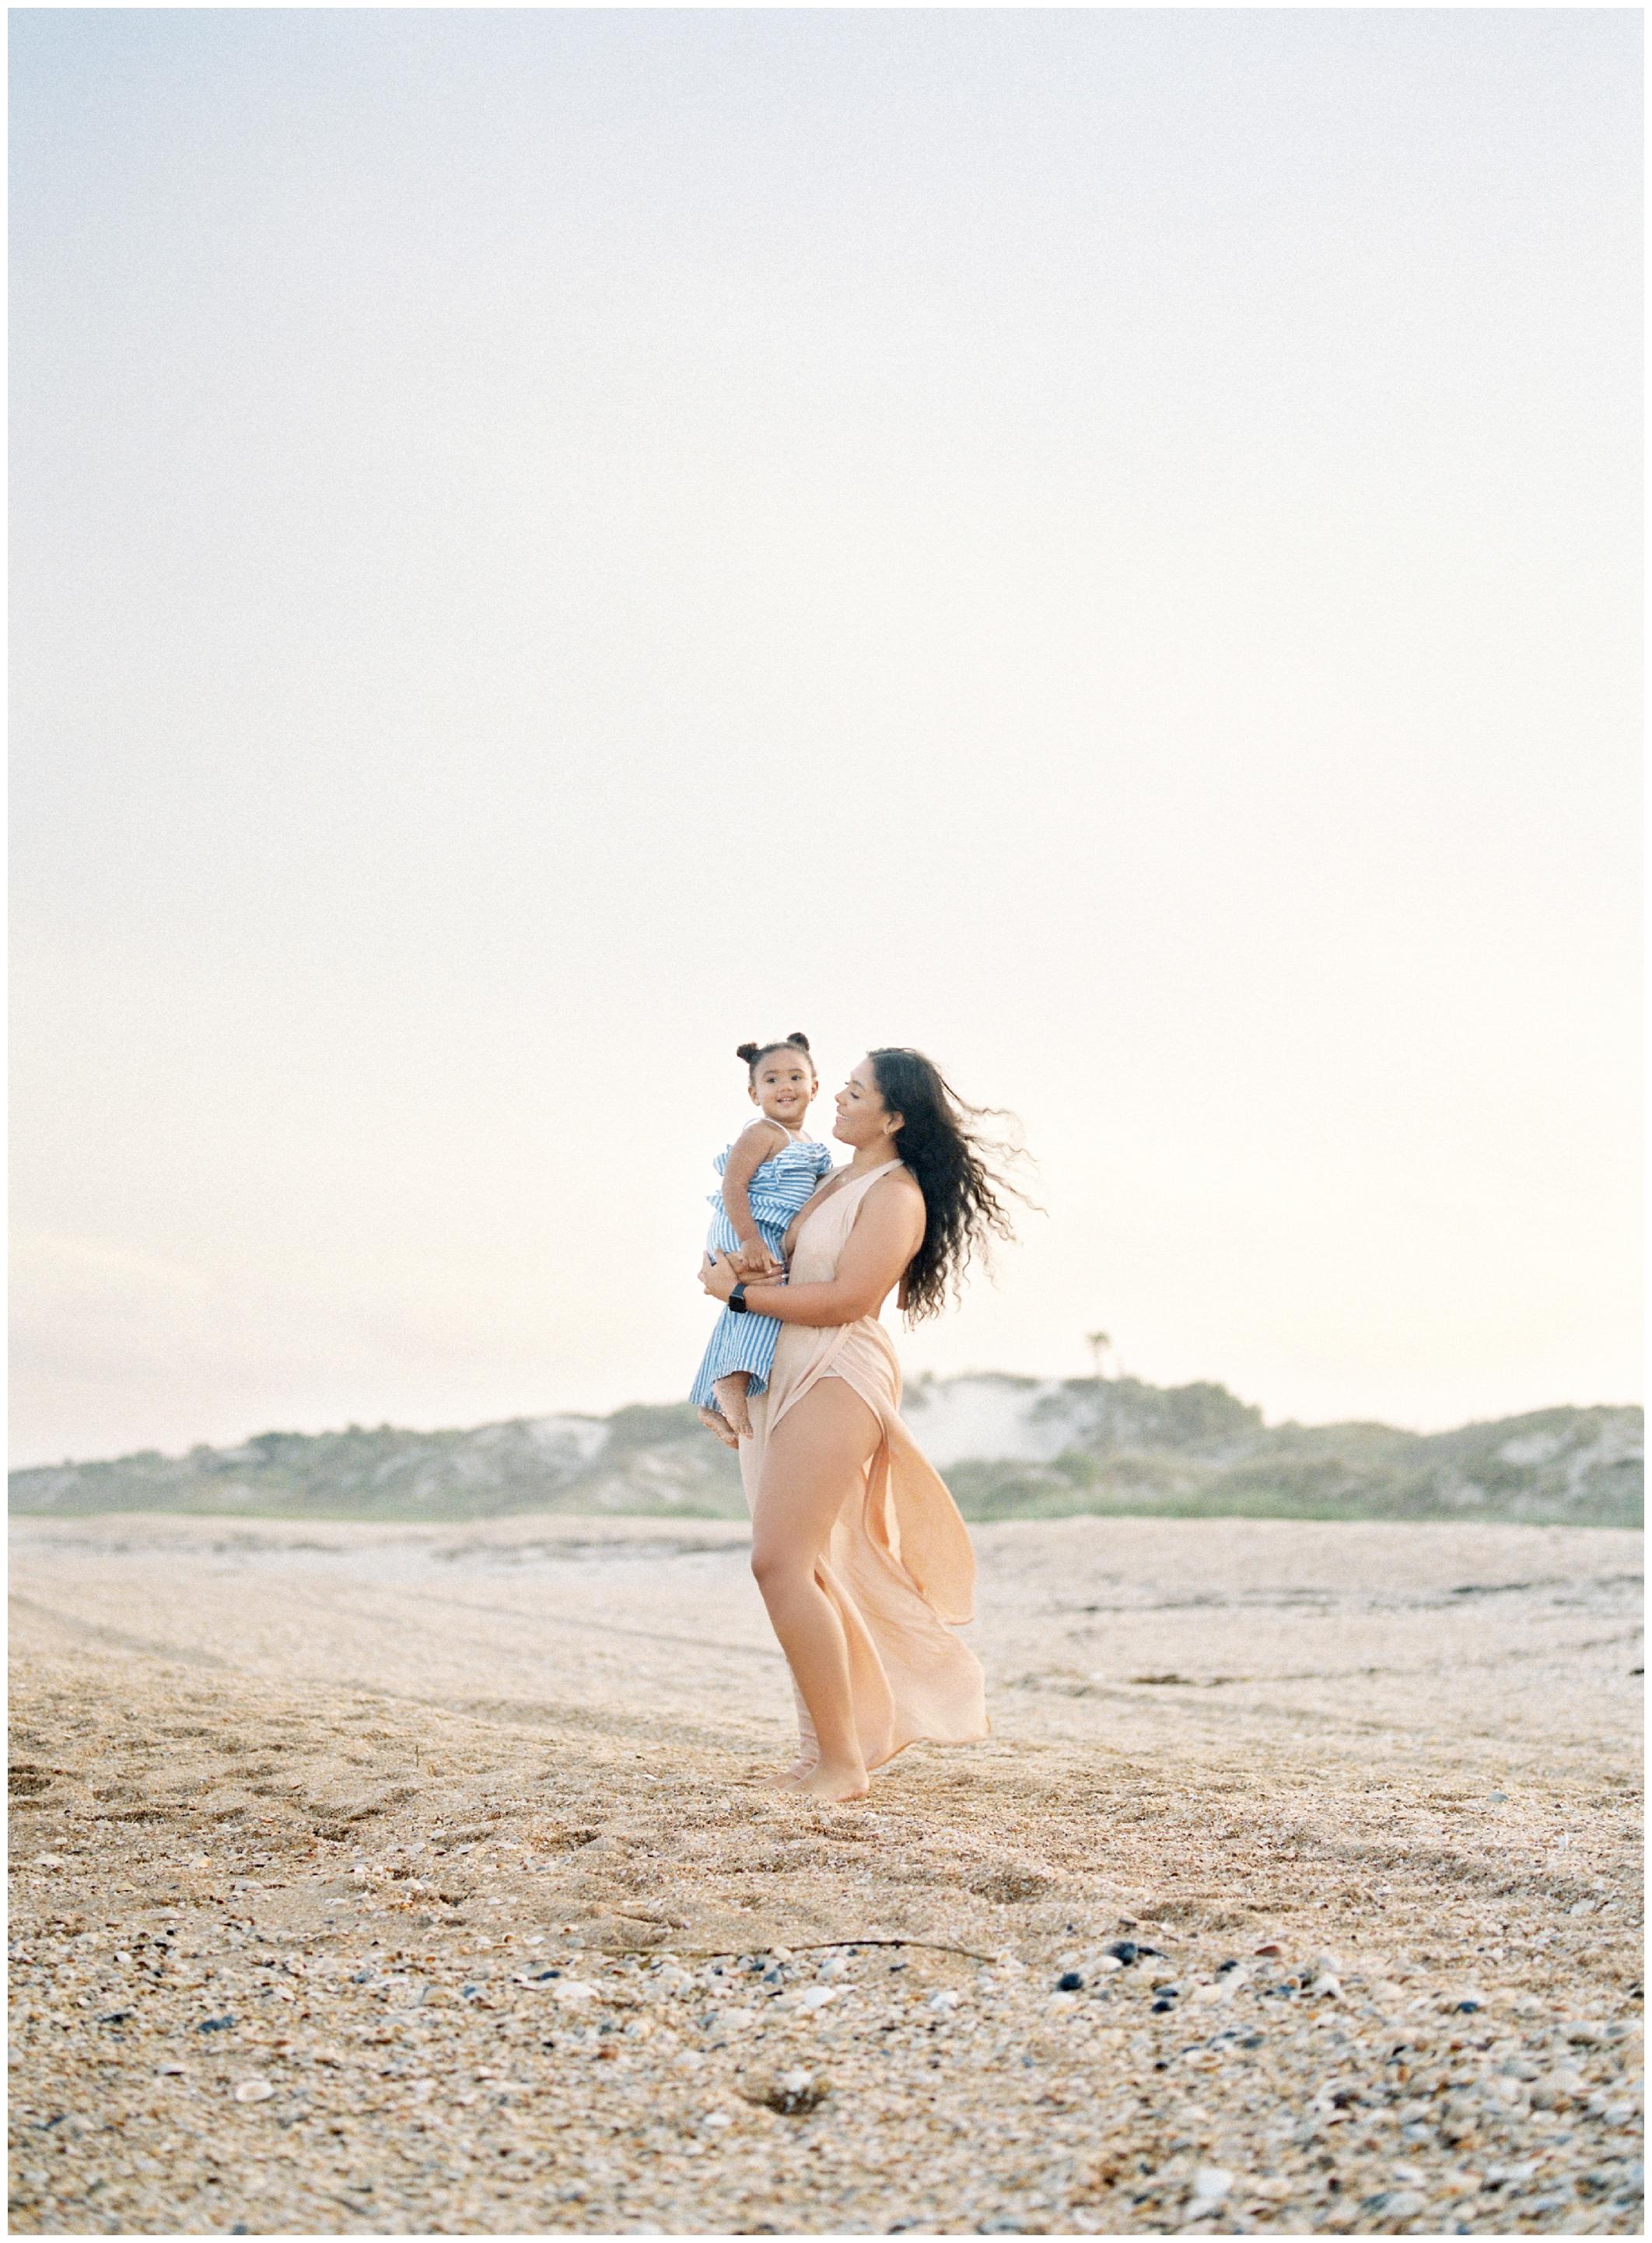 Lisa Silva Photography- Ponte Vedra Beach, St. Augustine and Jacksonville, Florida Fine Art Film Destination Wedding Photography- Family Lifestyle Session at Guana Preserve_0038a.jpg